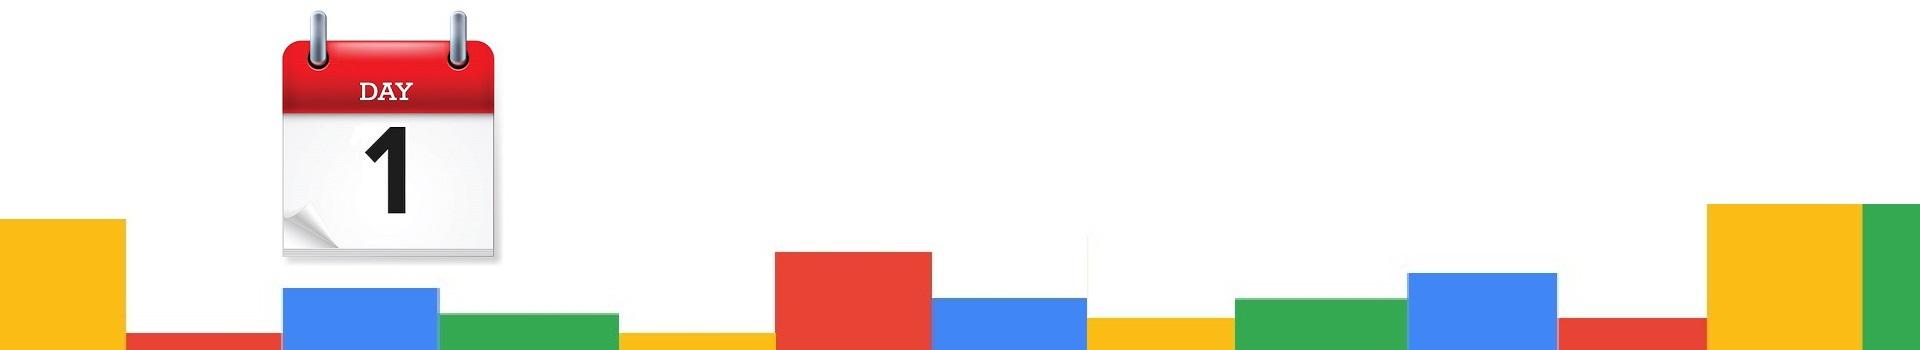 Google Day 1